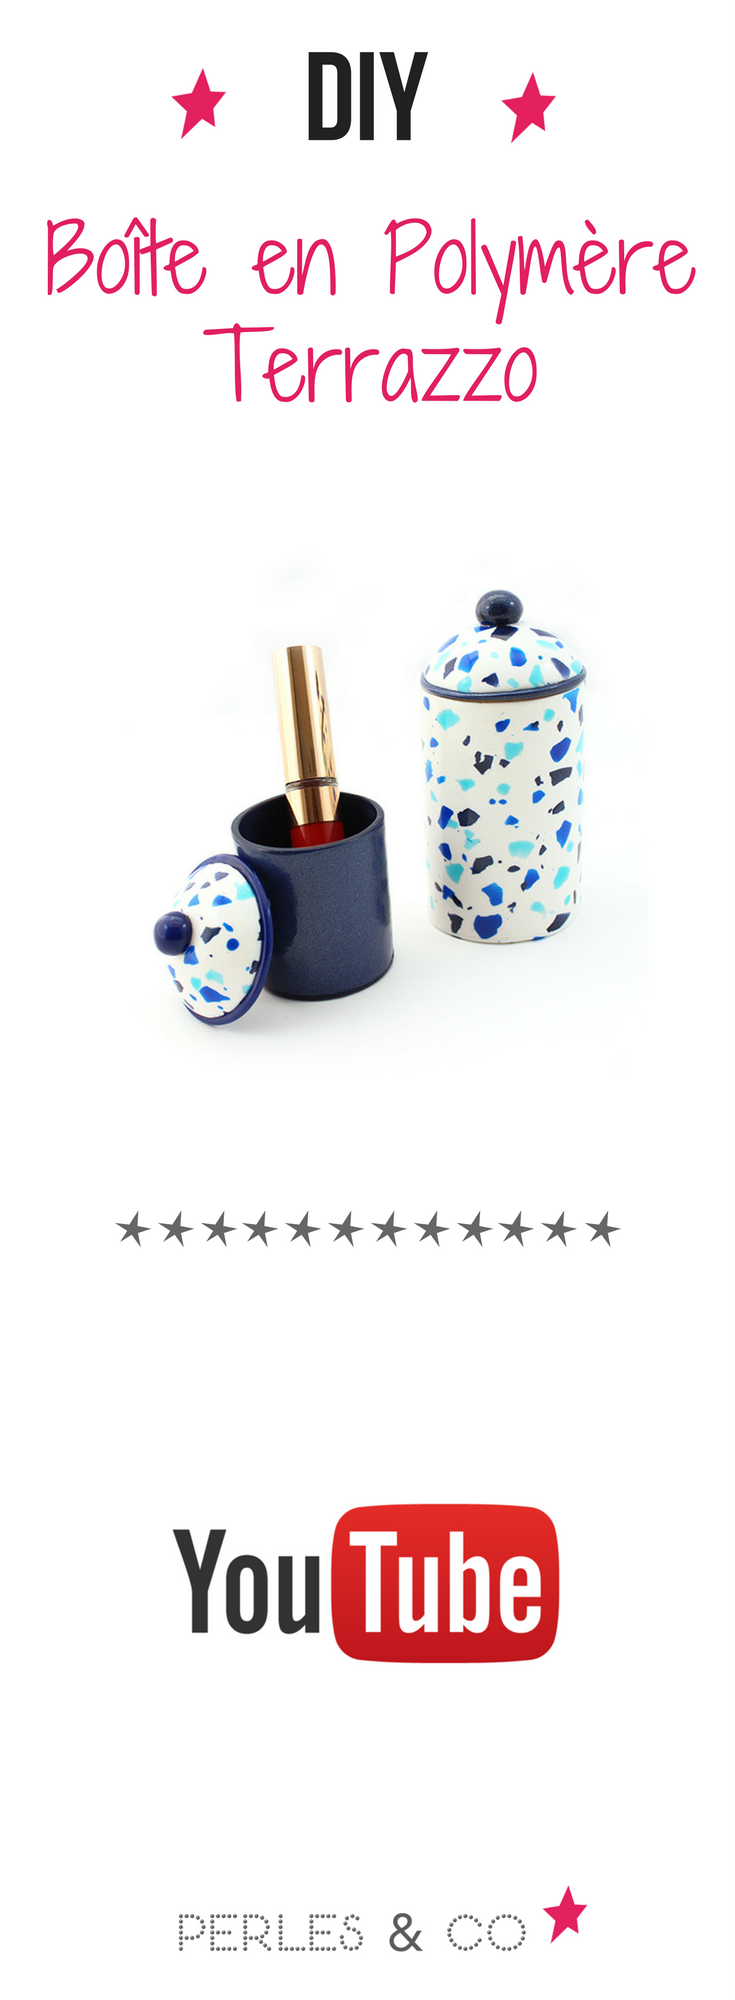 diy bo te en polym re terrazzo les tutoriels perles co pinterest p tes polym res pate. Black Bedroom Furniture Sets. Home Design Ideas